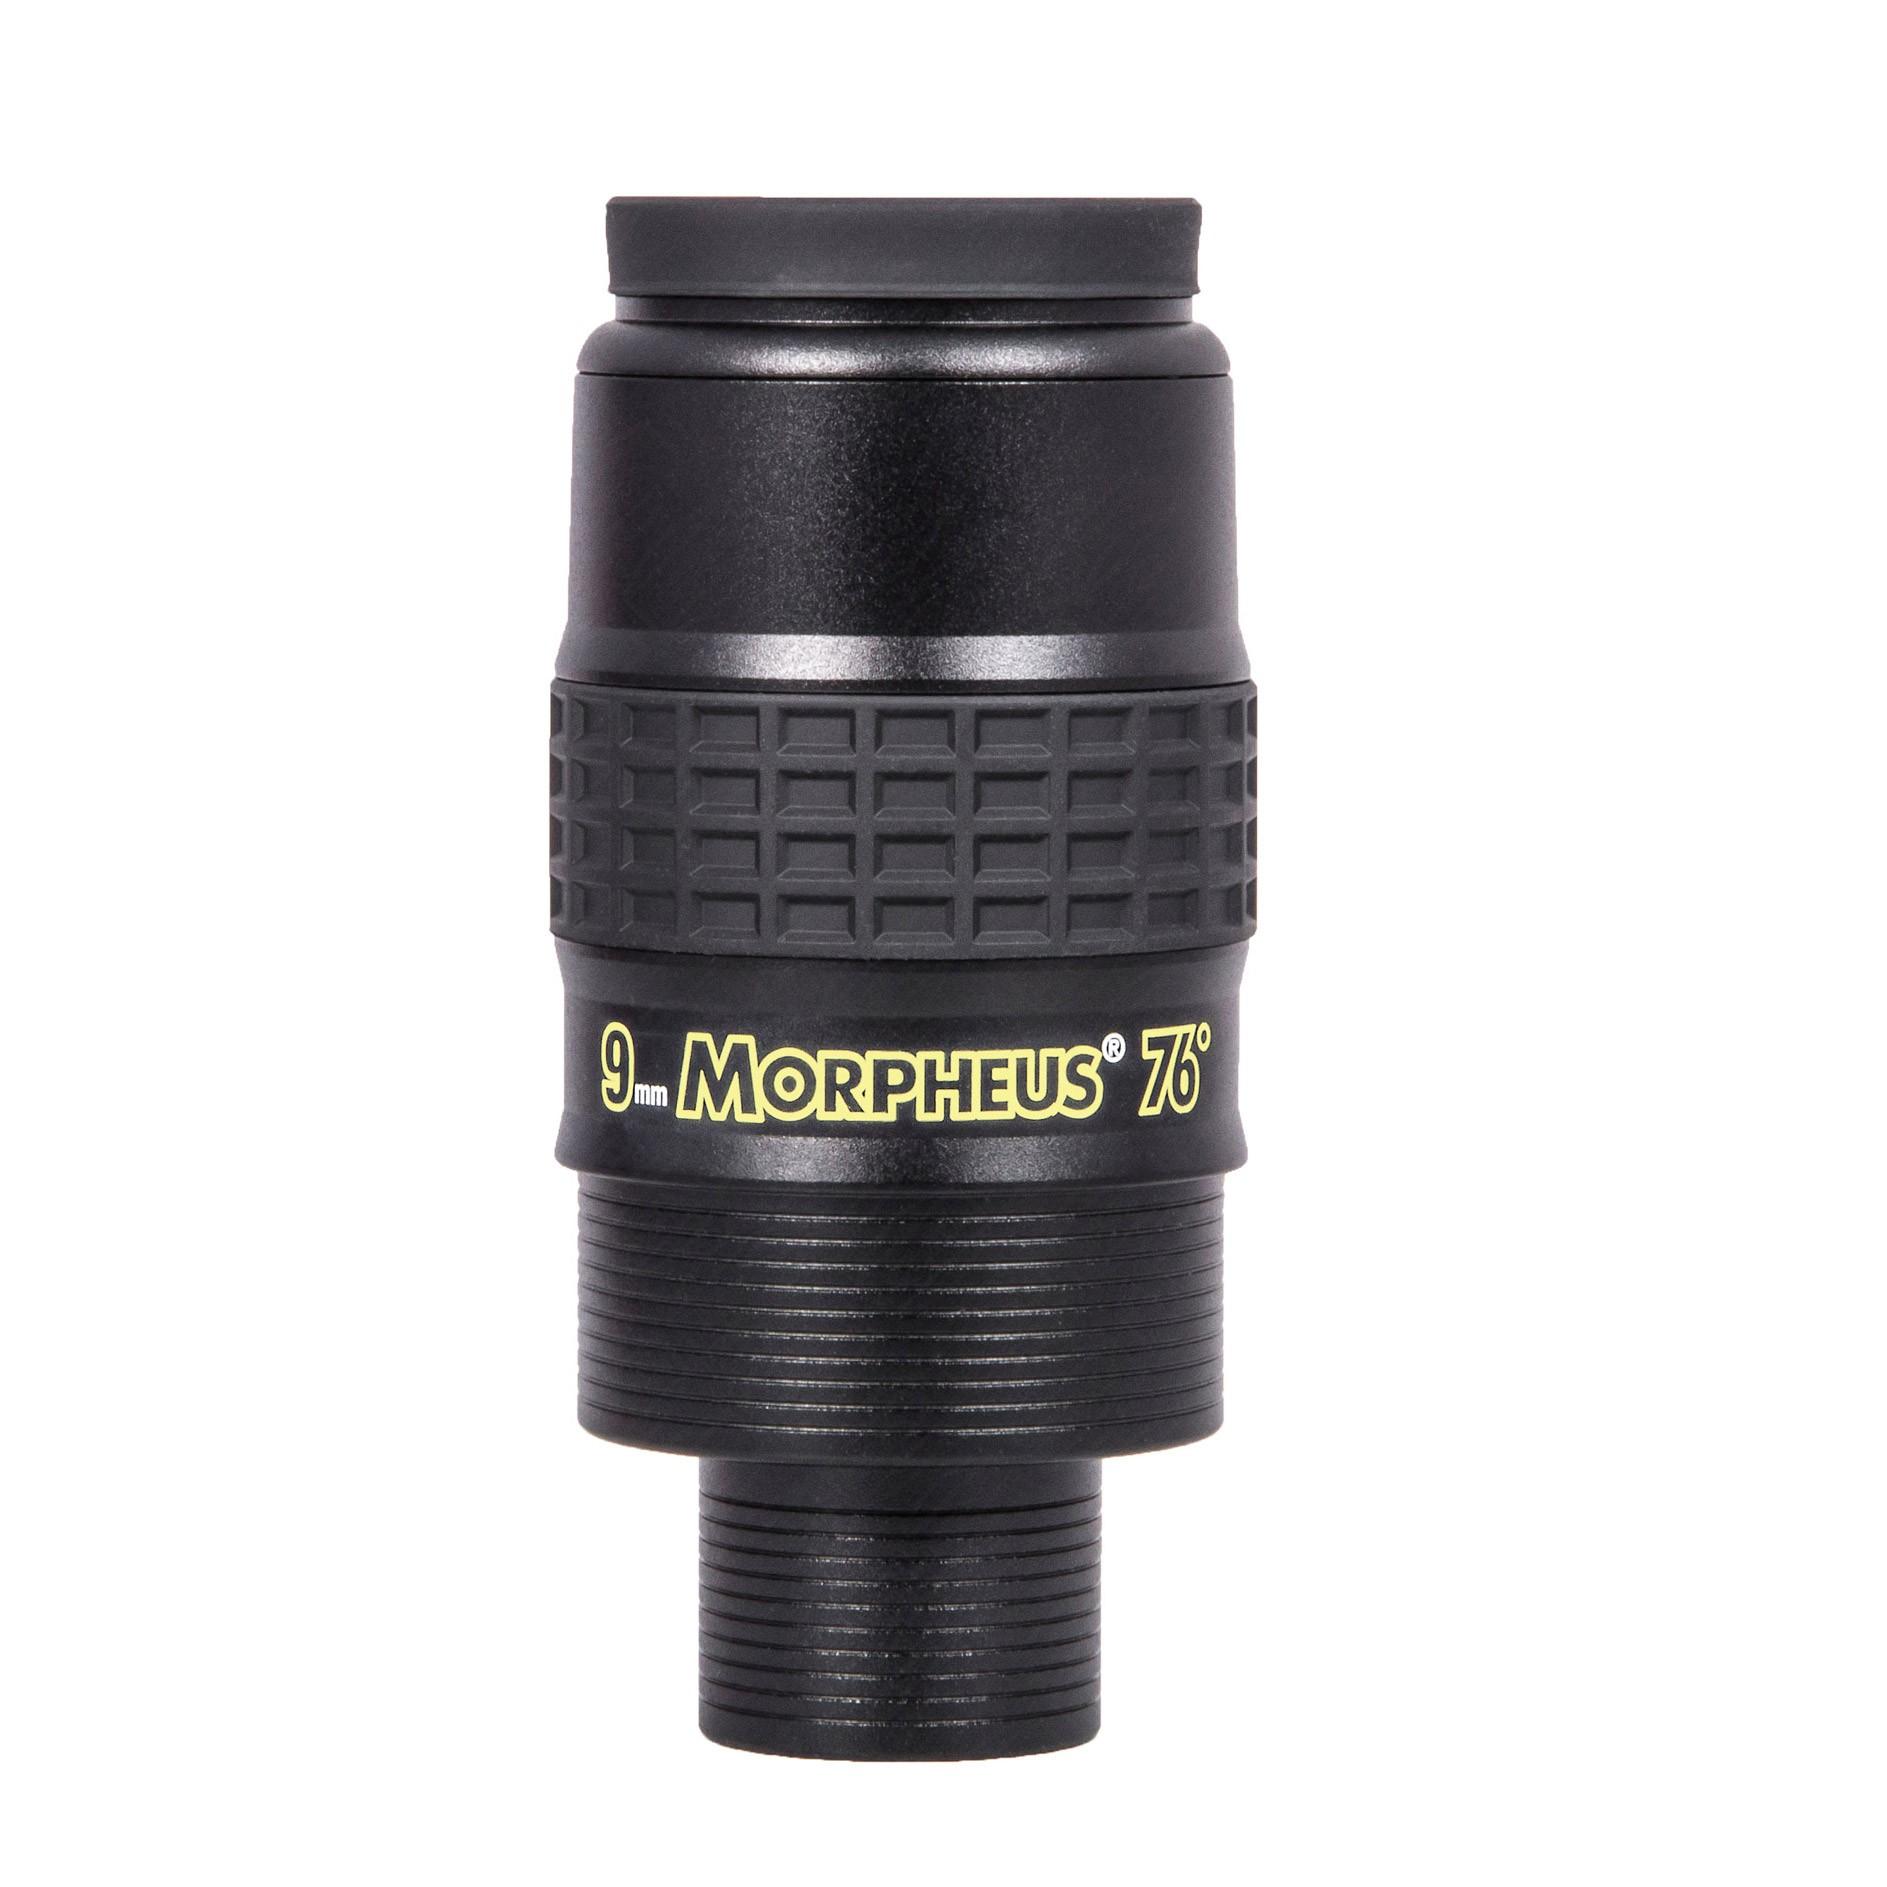 9 mm Morpheus 76° widefield eyepiece